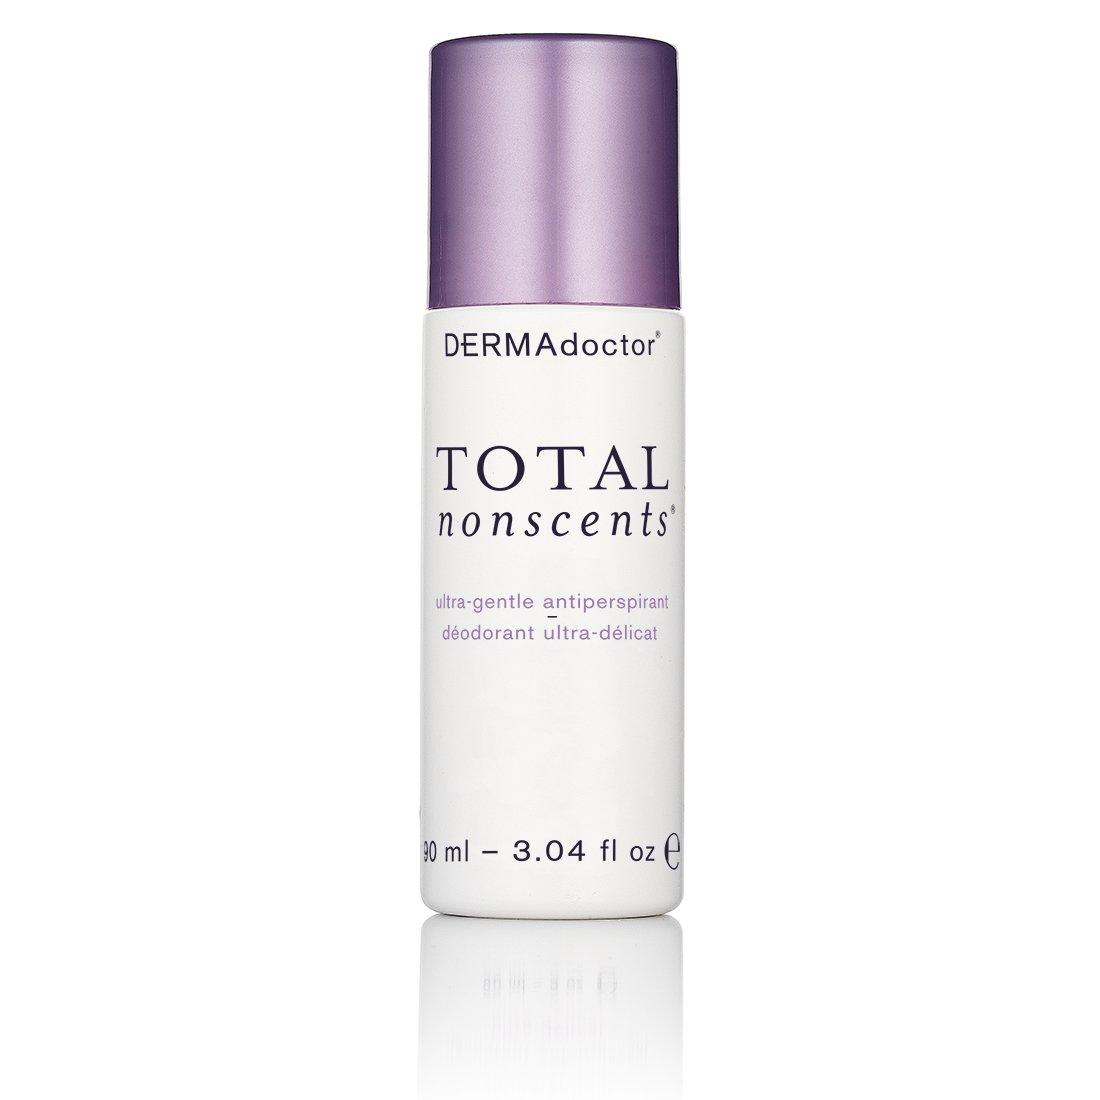 DERMAdoctor Total Nonscents Ultra-Gentle Antiperspirant, 3 fl. oz.